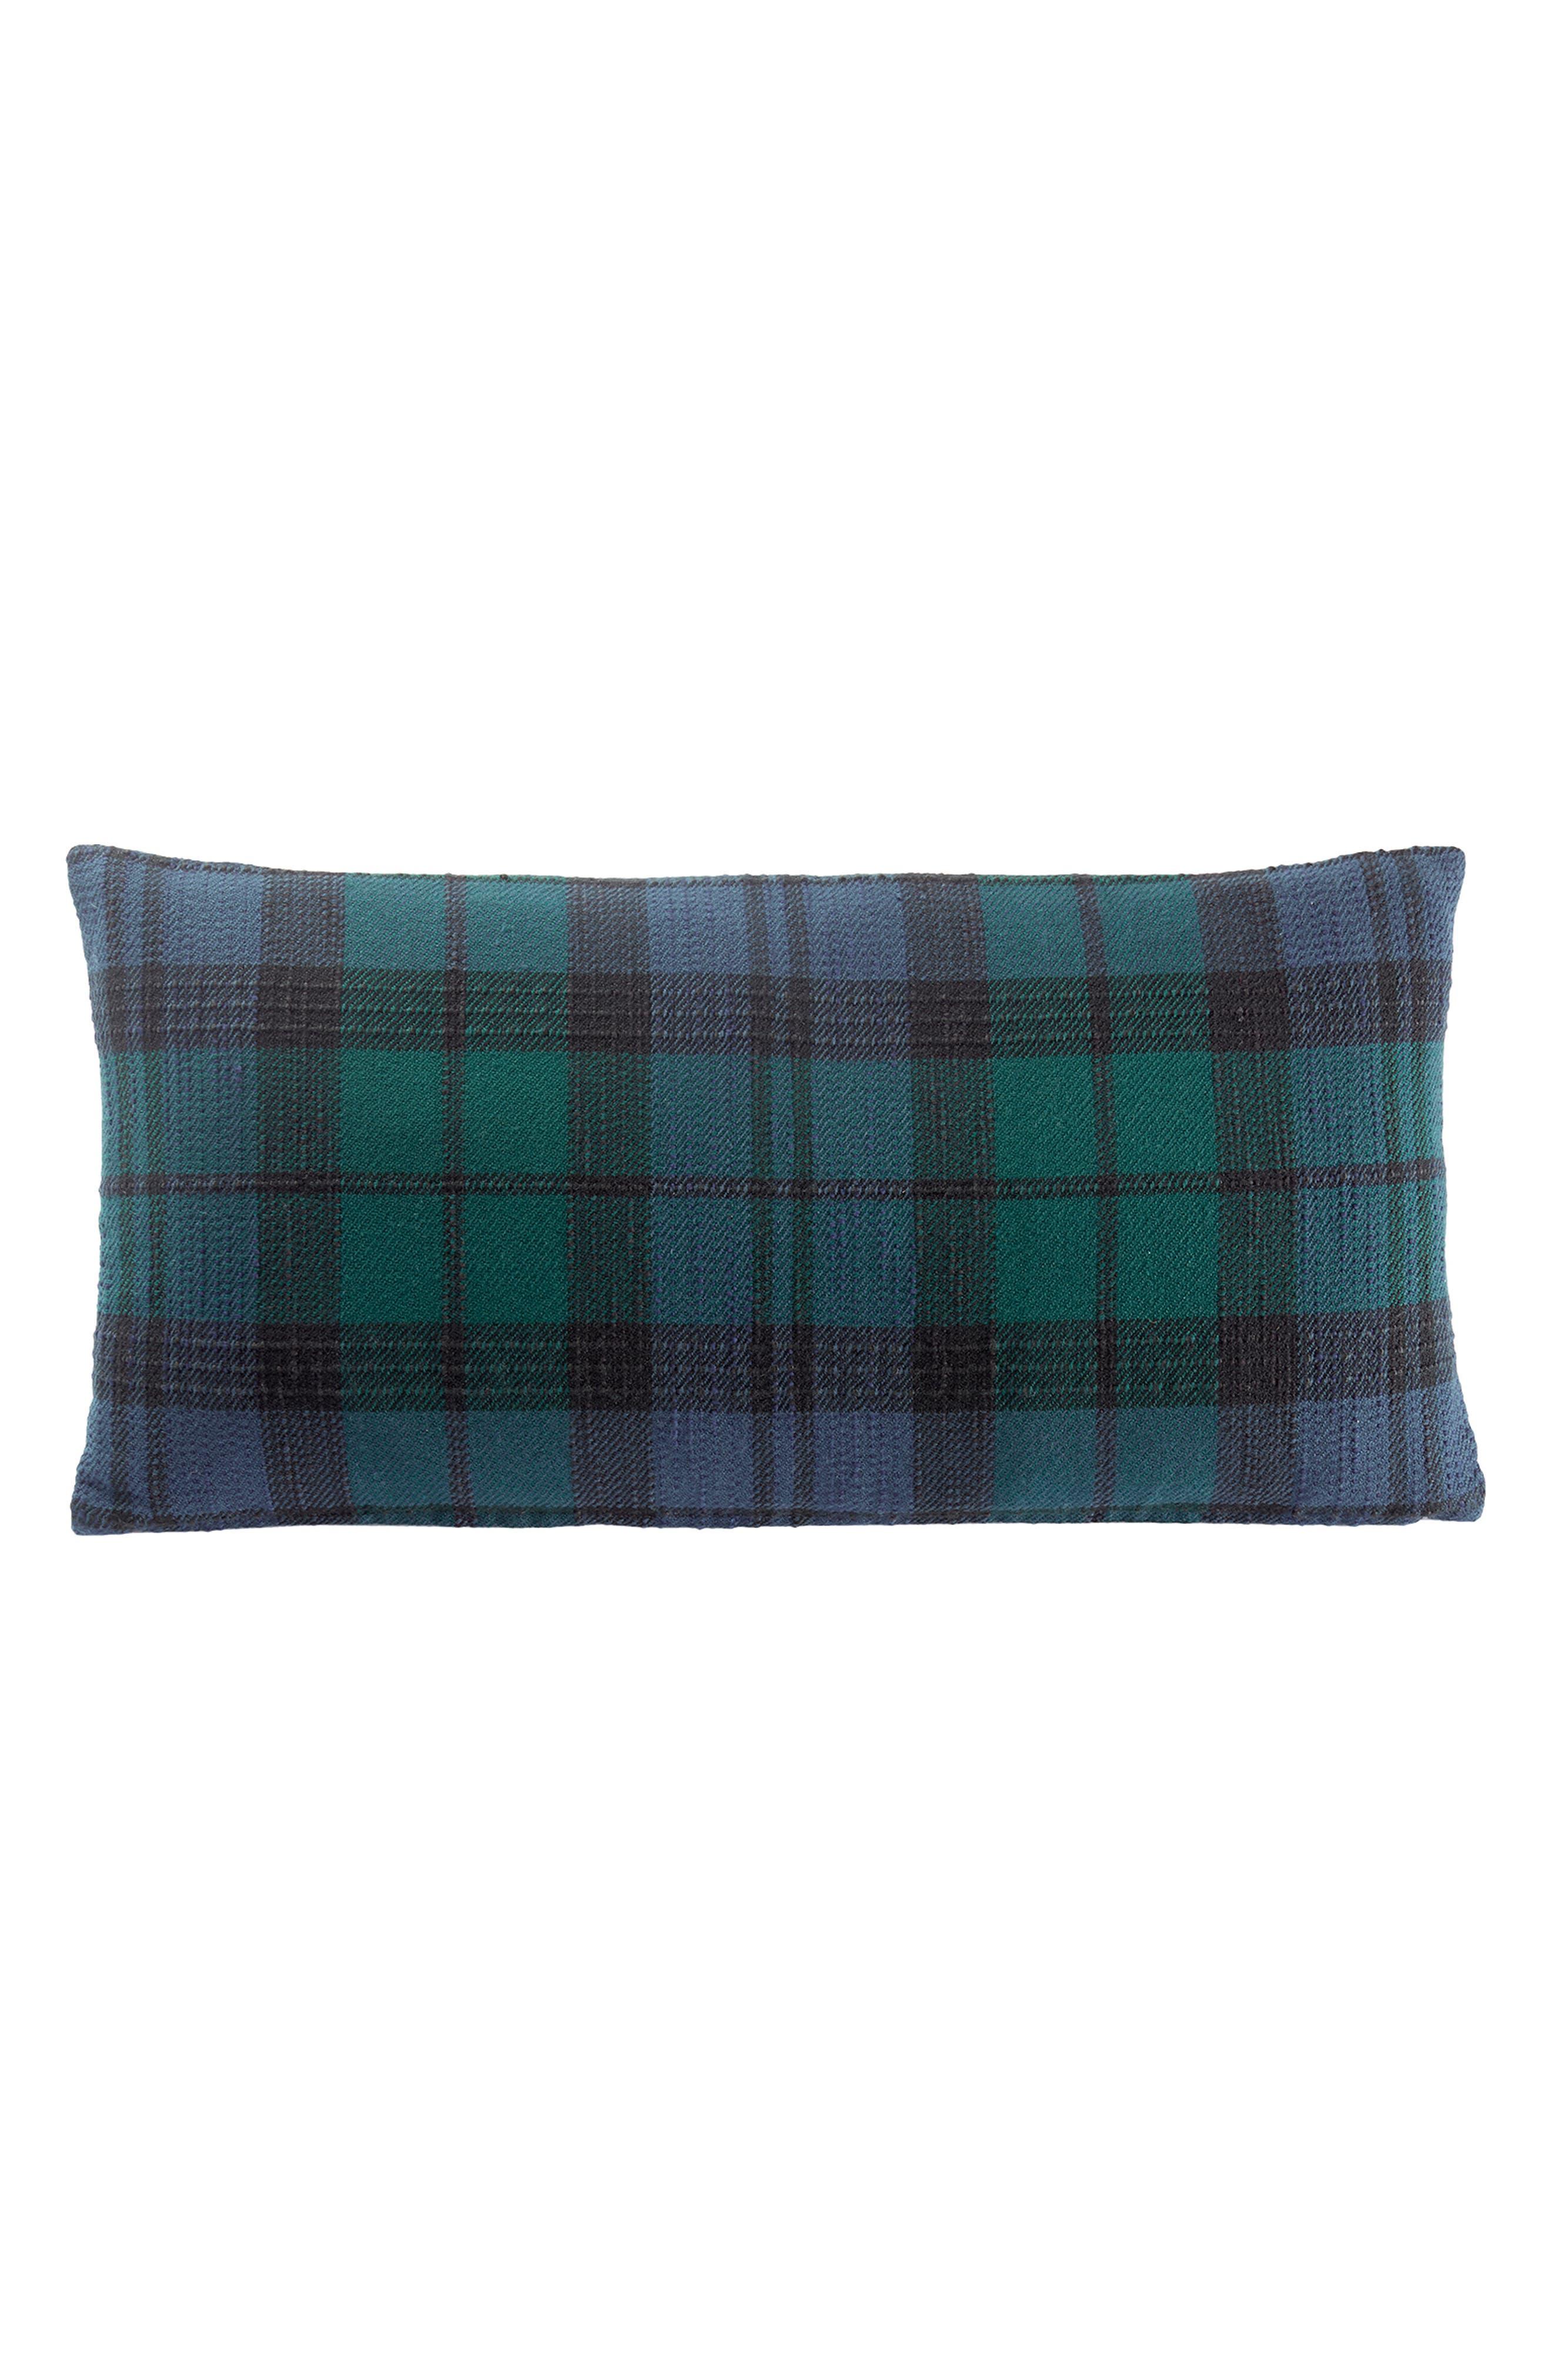 Plaid Hug Accent Pillow,                             Main thumbnail 1, color,                             300